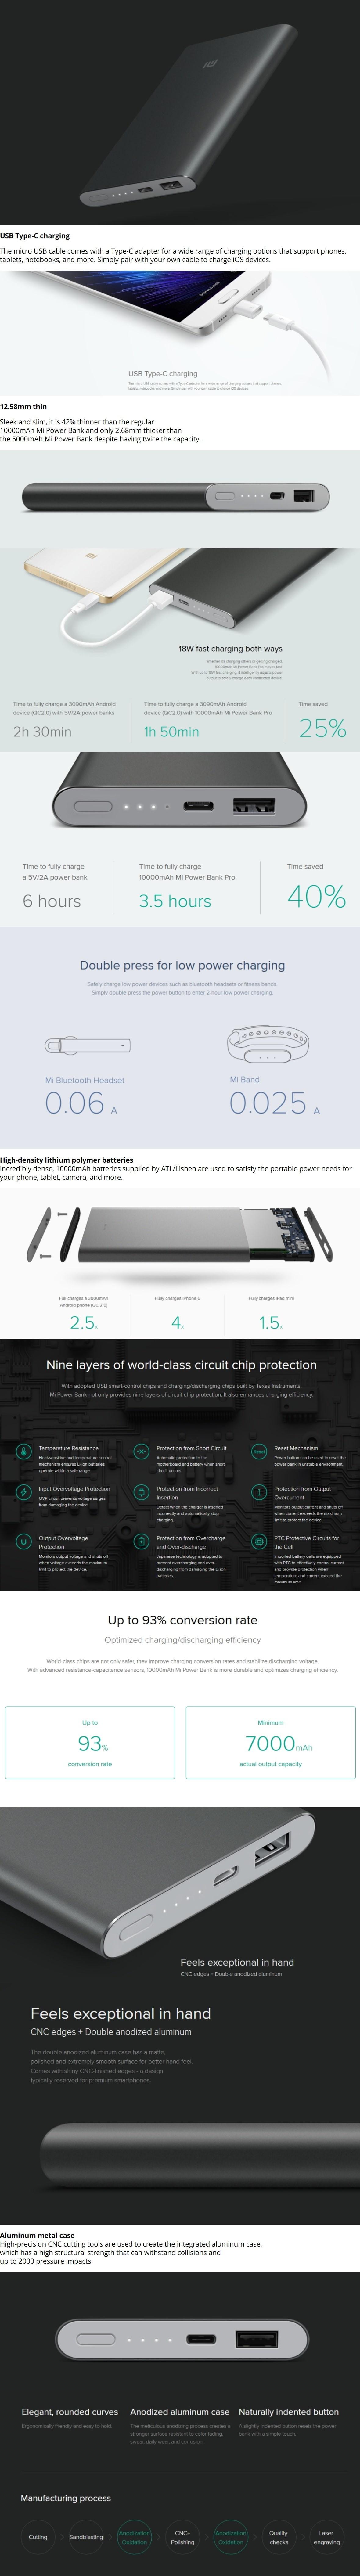 Prezentare-Xiaomi-Mi-Power-Bank-Proa02abdbf411f7cde.jpg